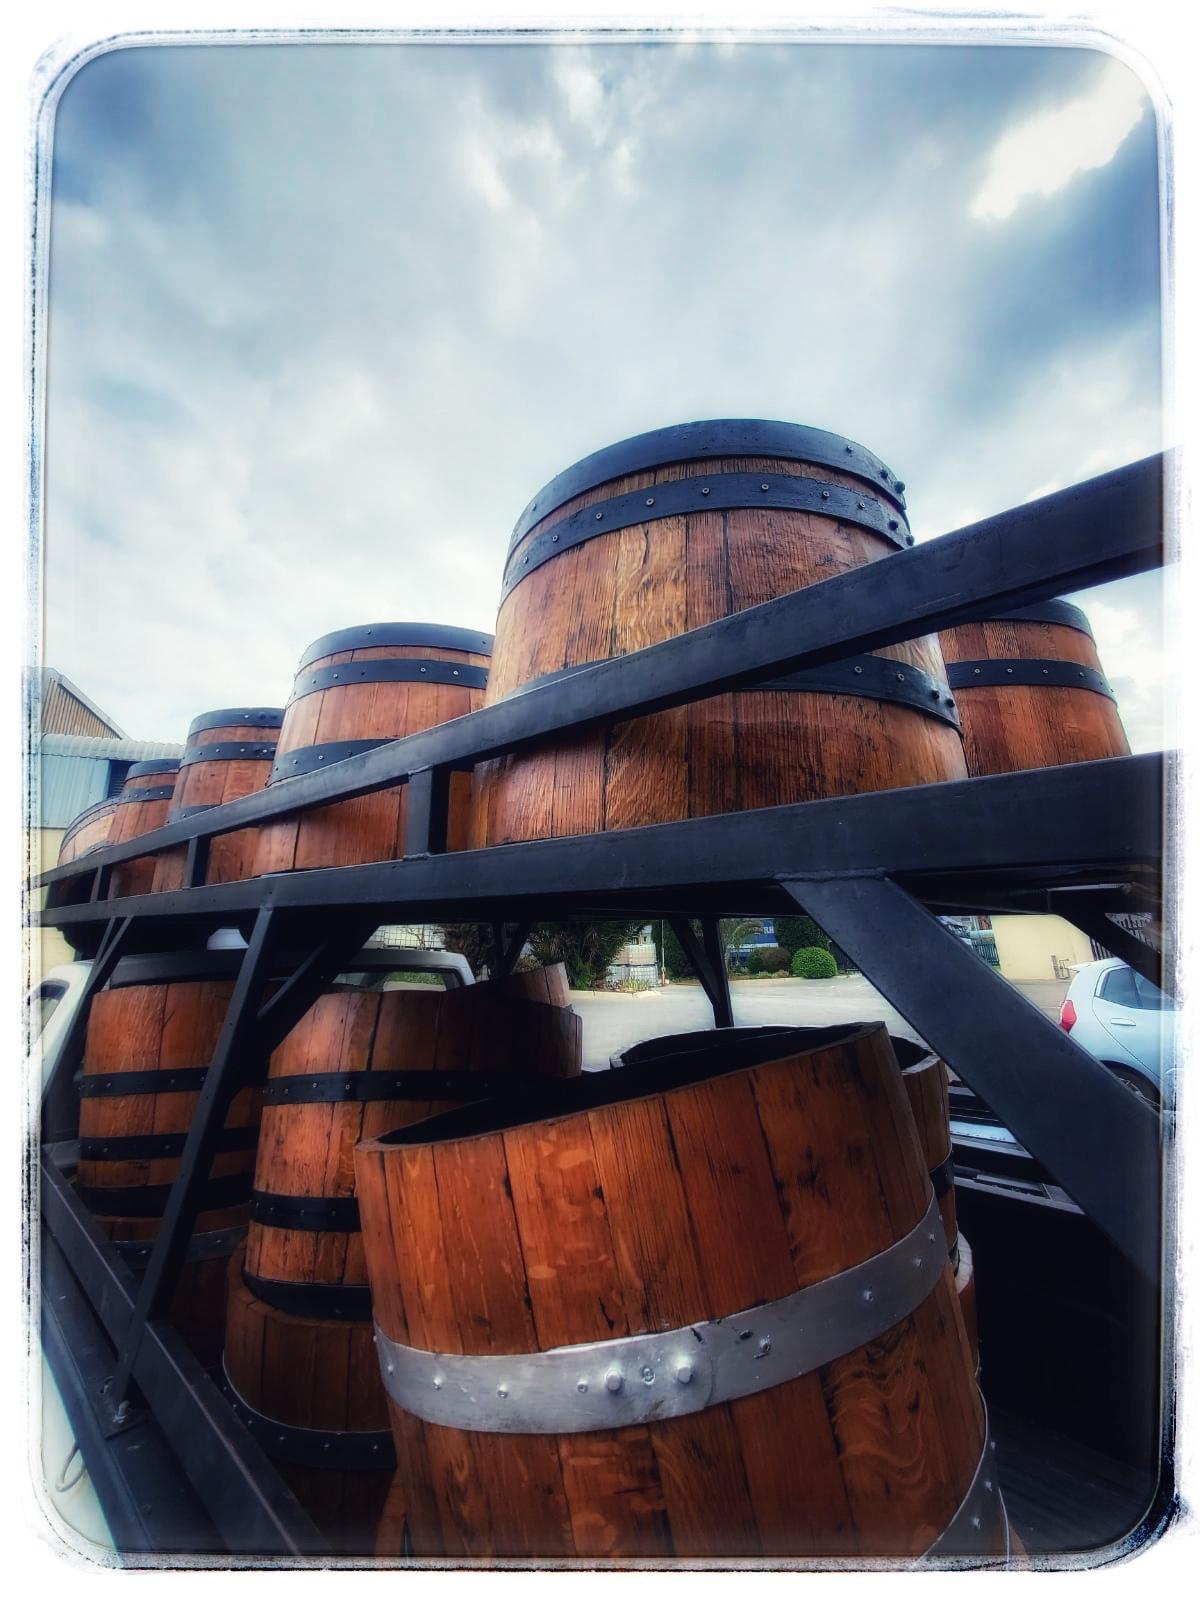 Wine Barrel Creations/Craft